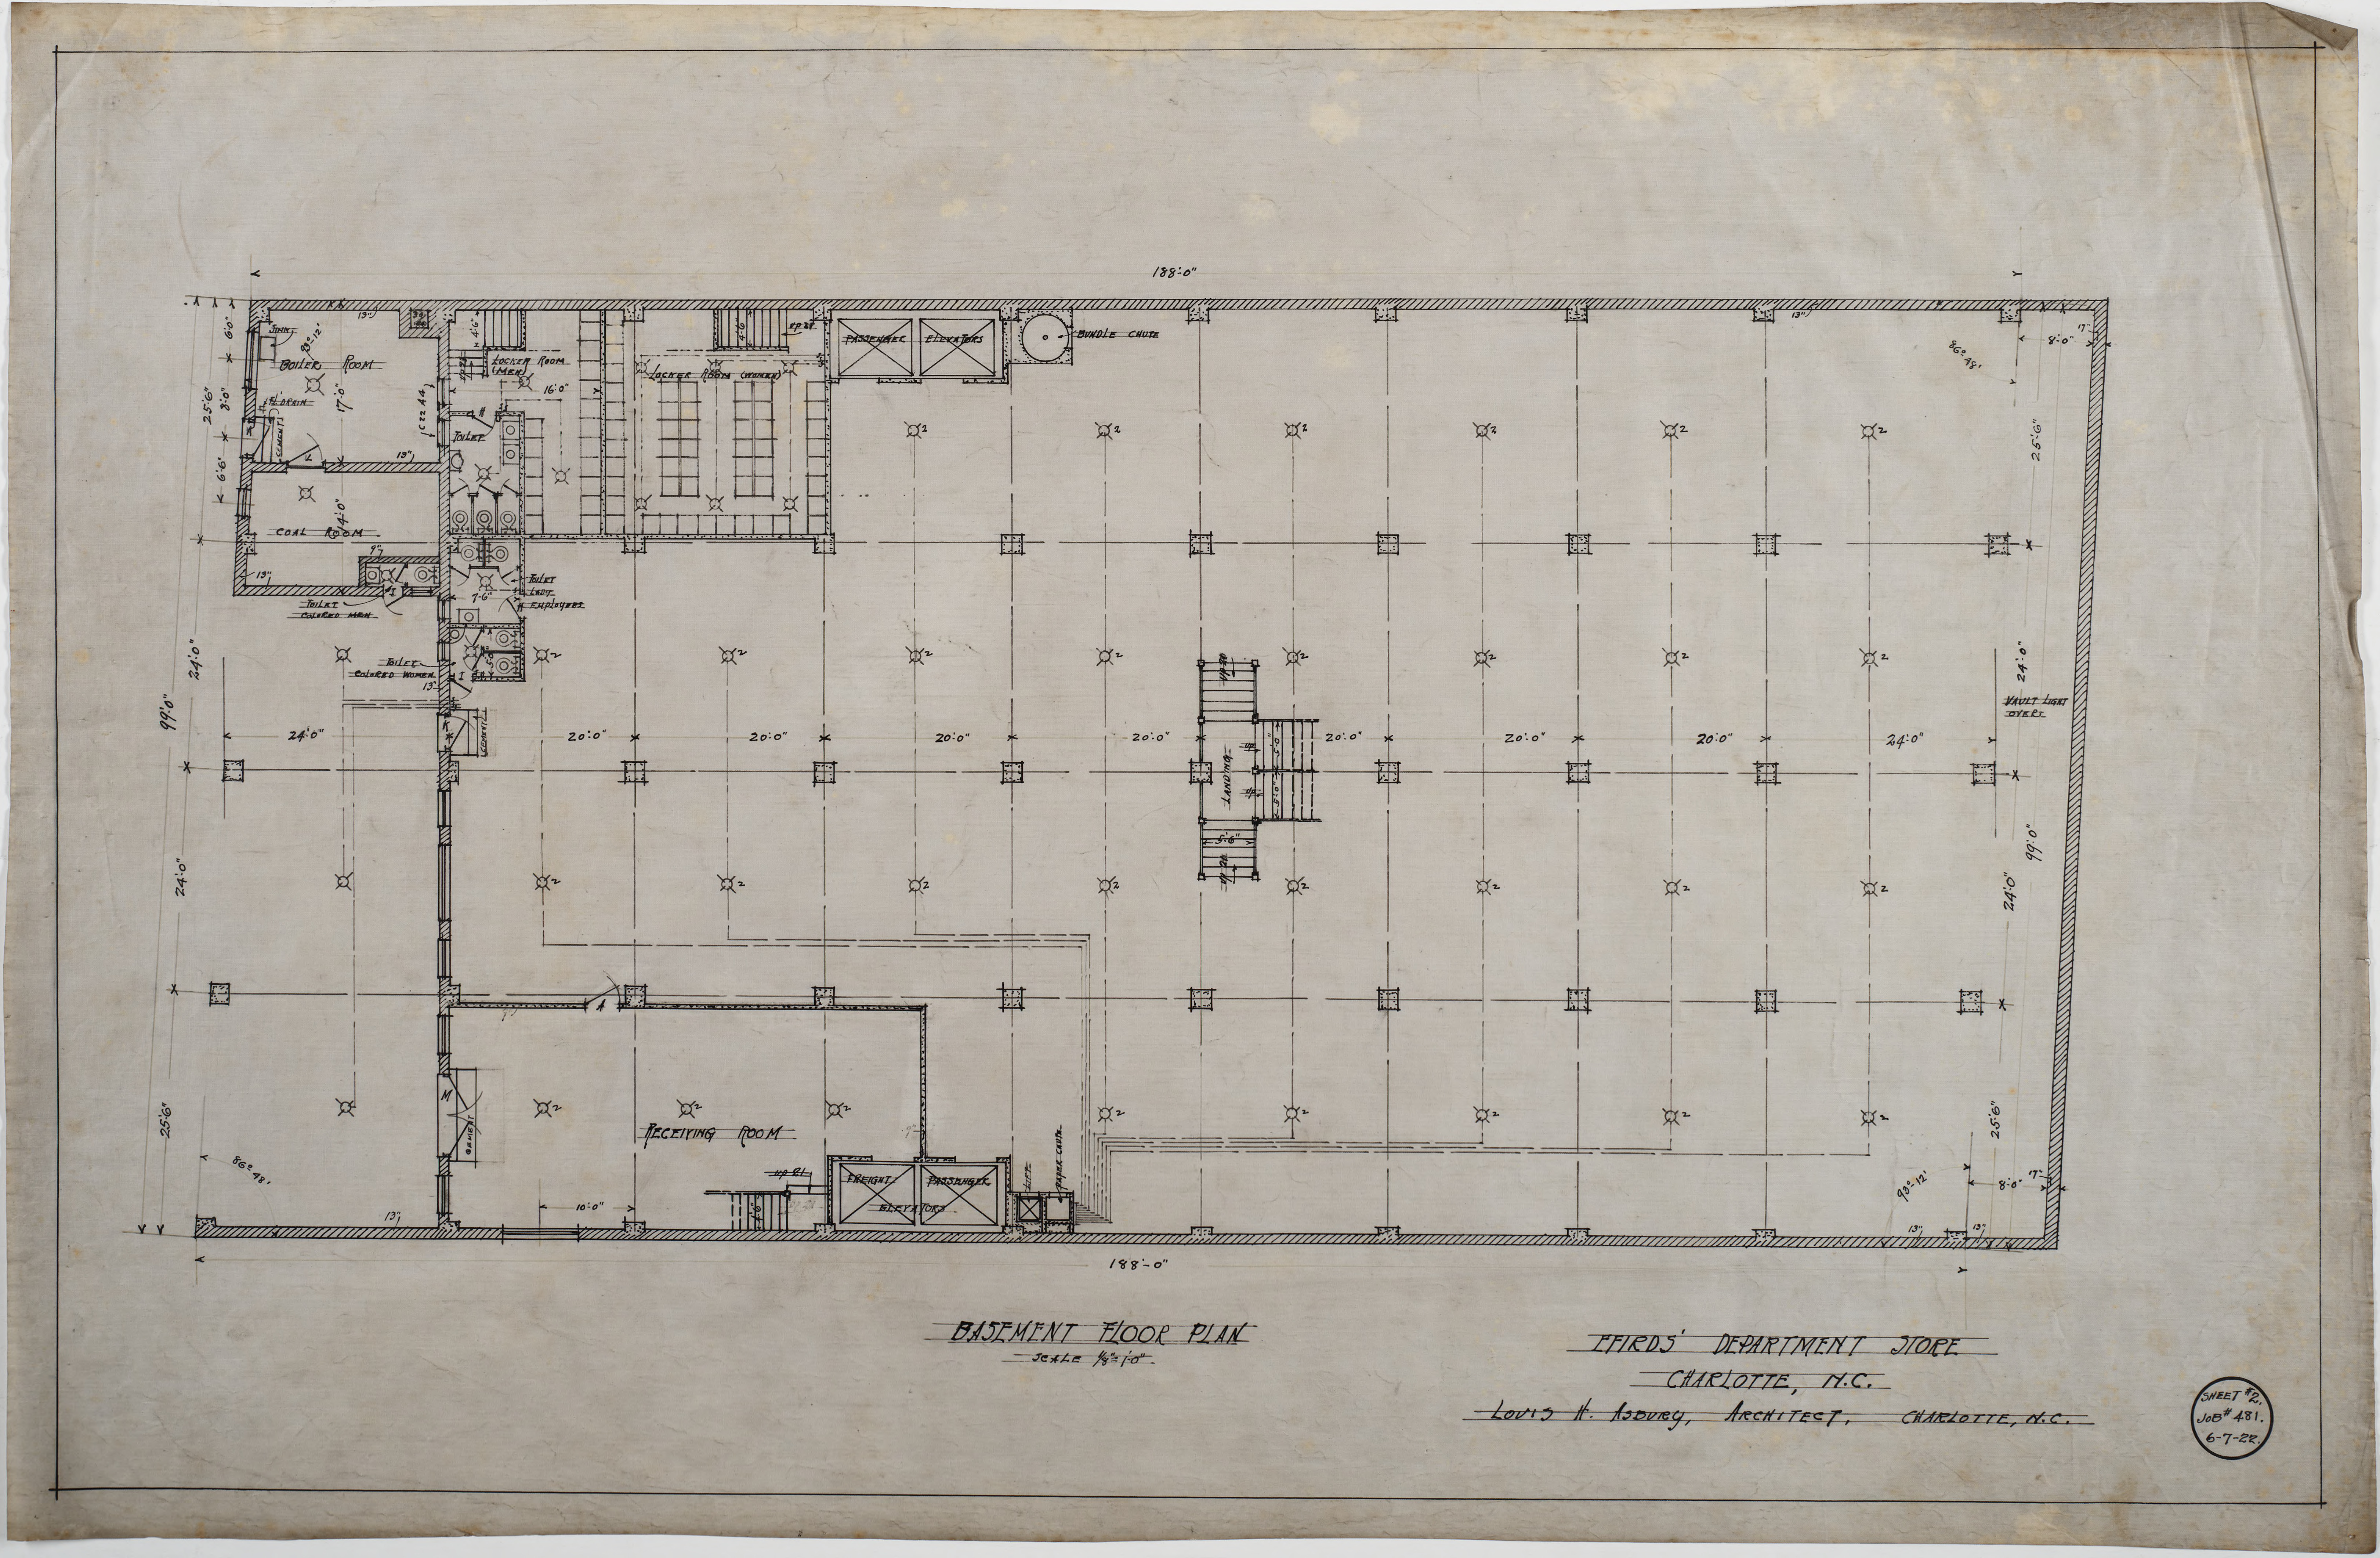 Basement Floor Plan (Efird's Department Store (Charlotte